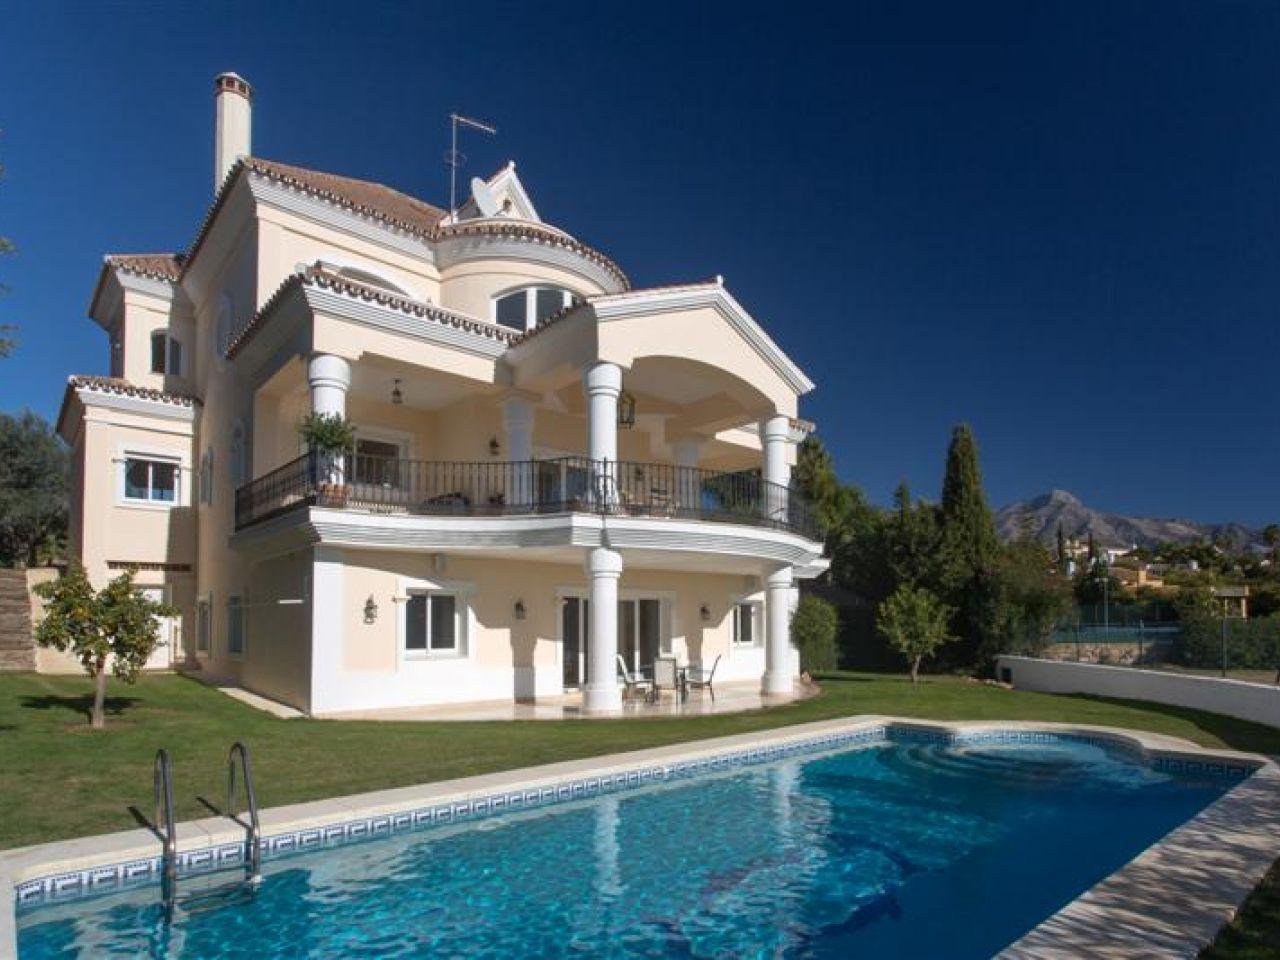 Single Family Home for Sale at Frontline golf villa in Los Naranjos Marbella, Costa Del Sol 29660 Spain